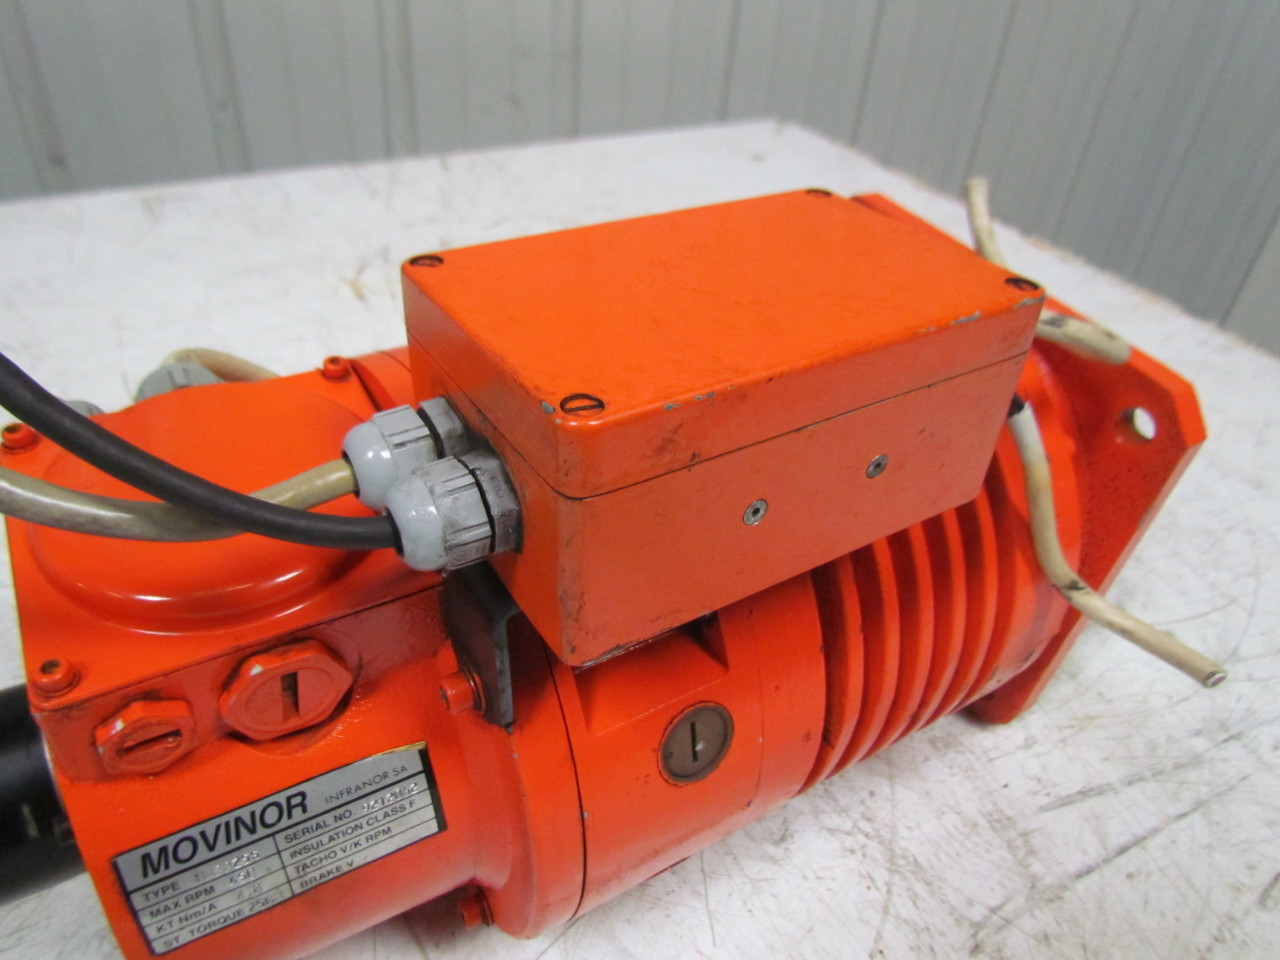 Movinor Mm8025s Servo Motor W Heidenhain Rod 426b 5000